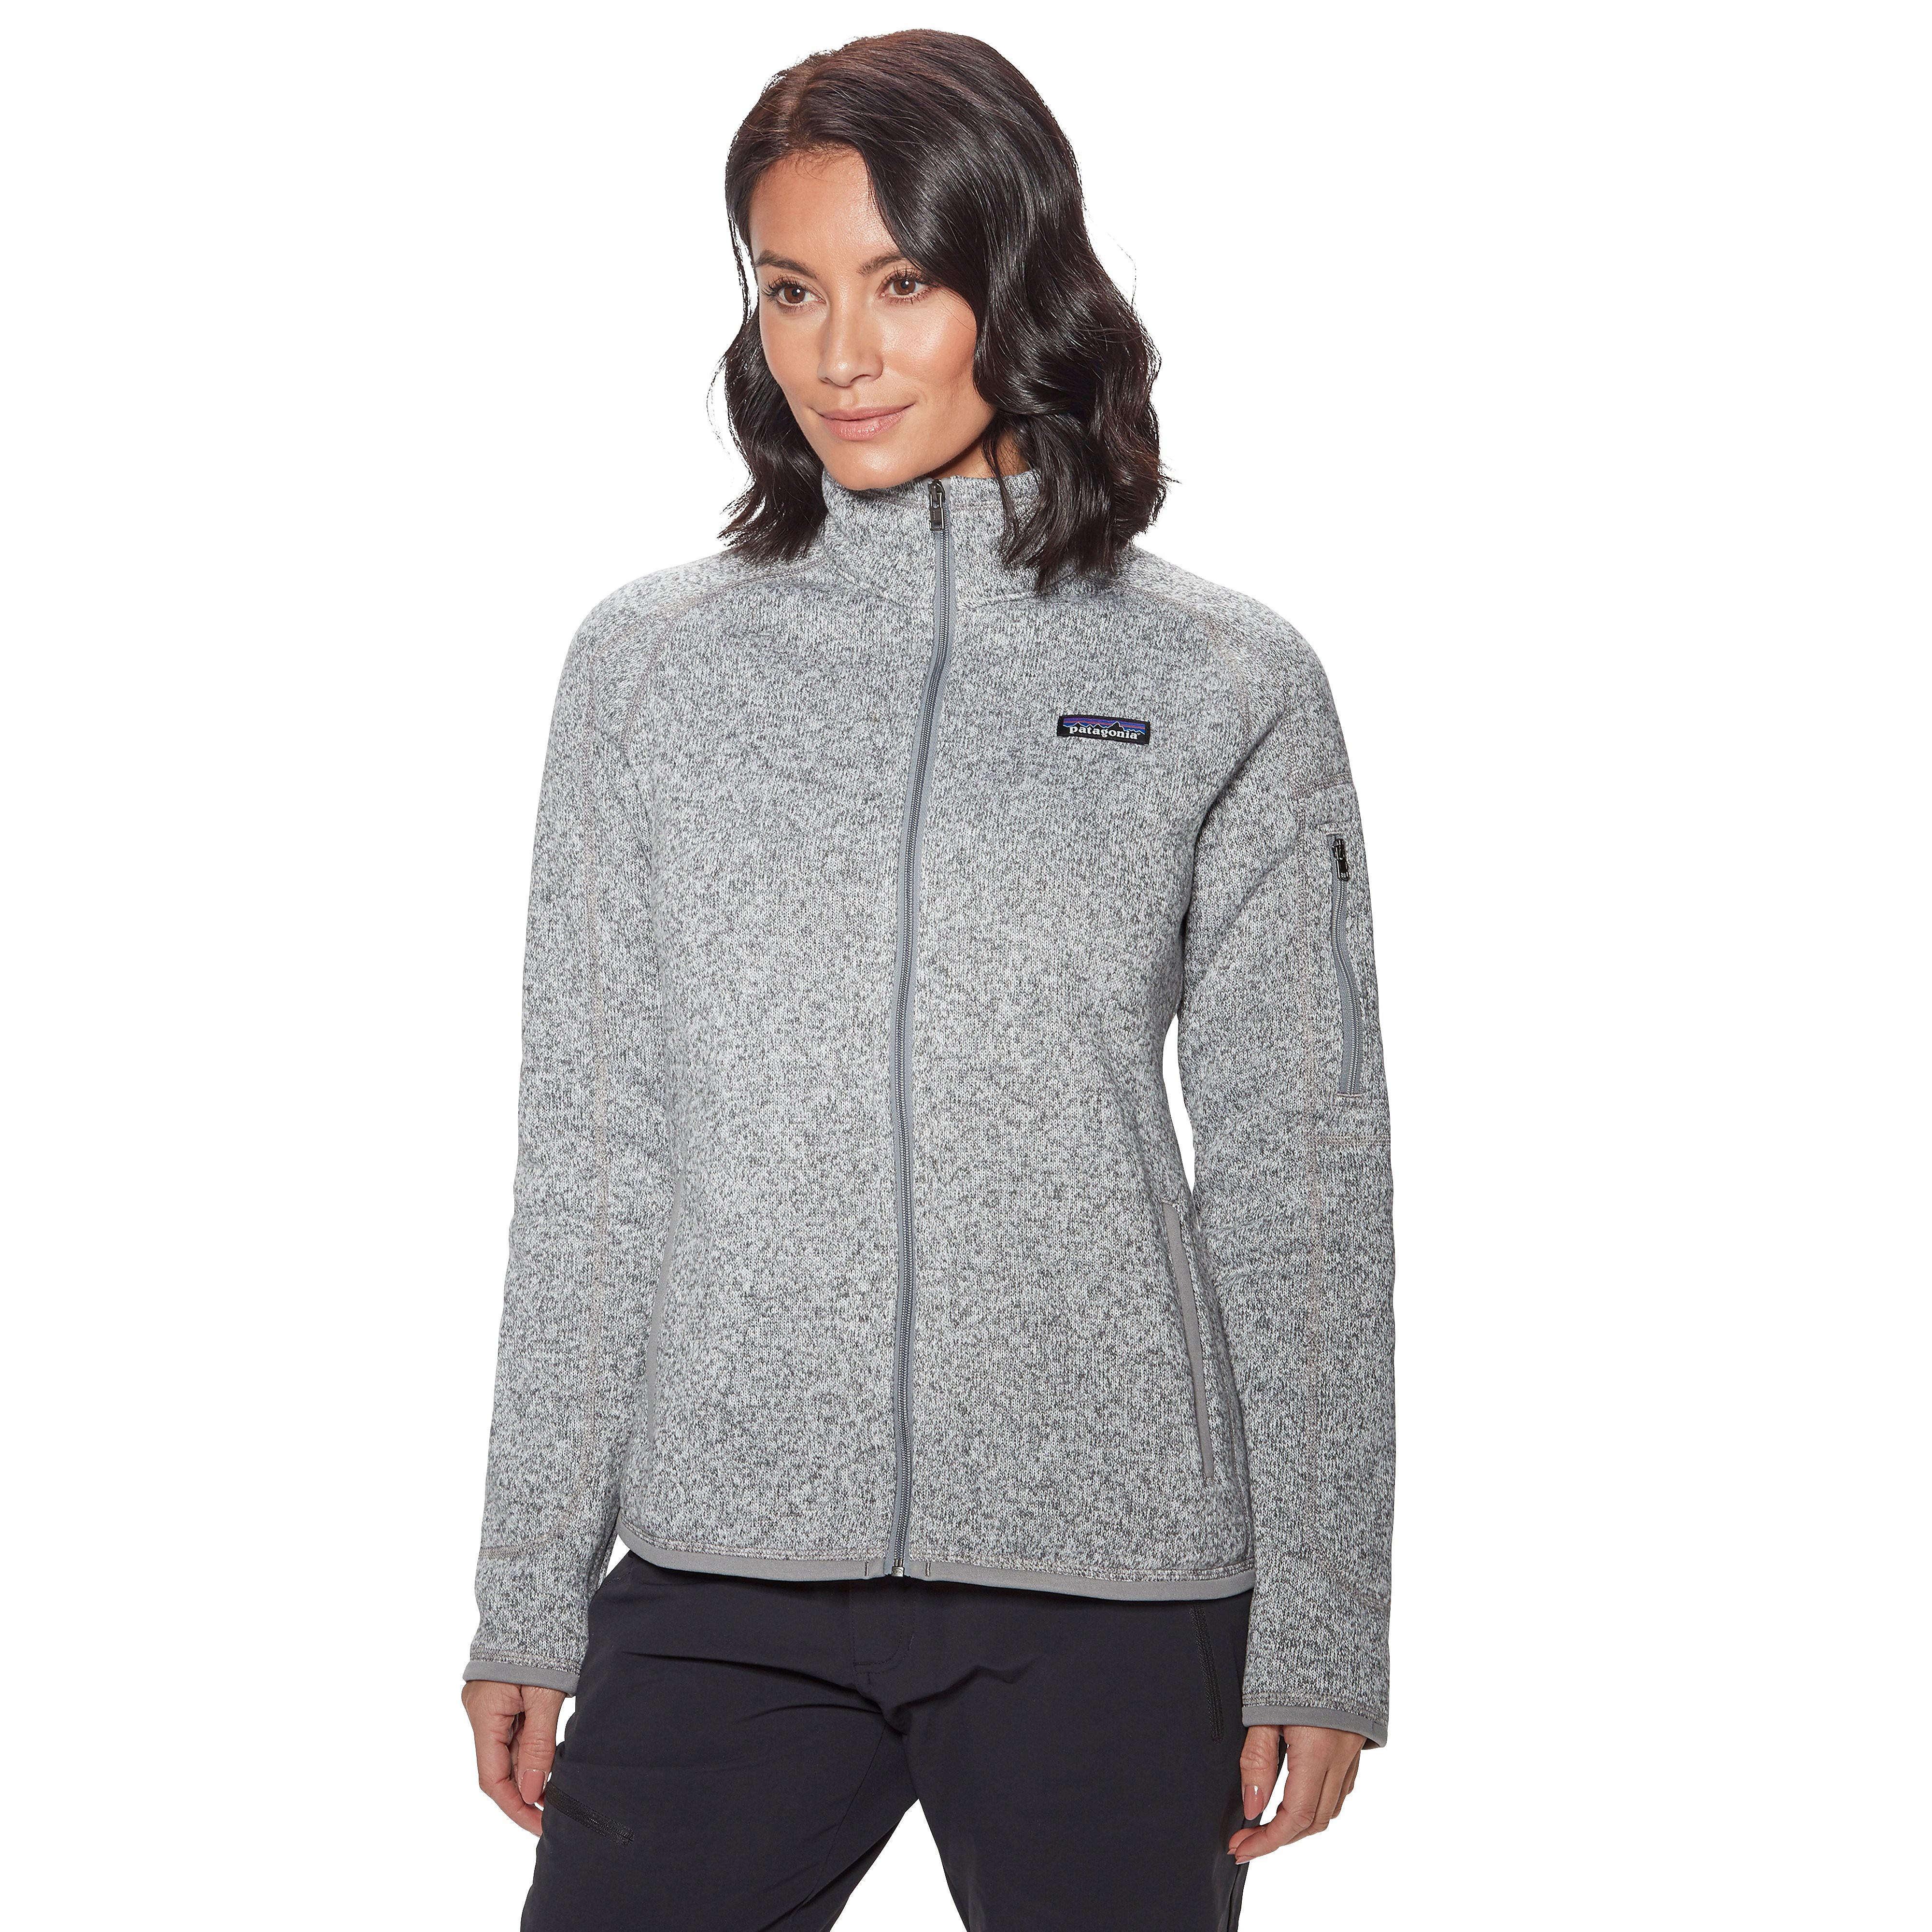 Patagonia Better Sweater Women's Fleece Jacket